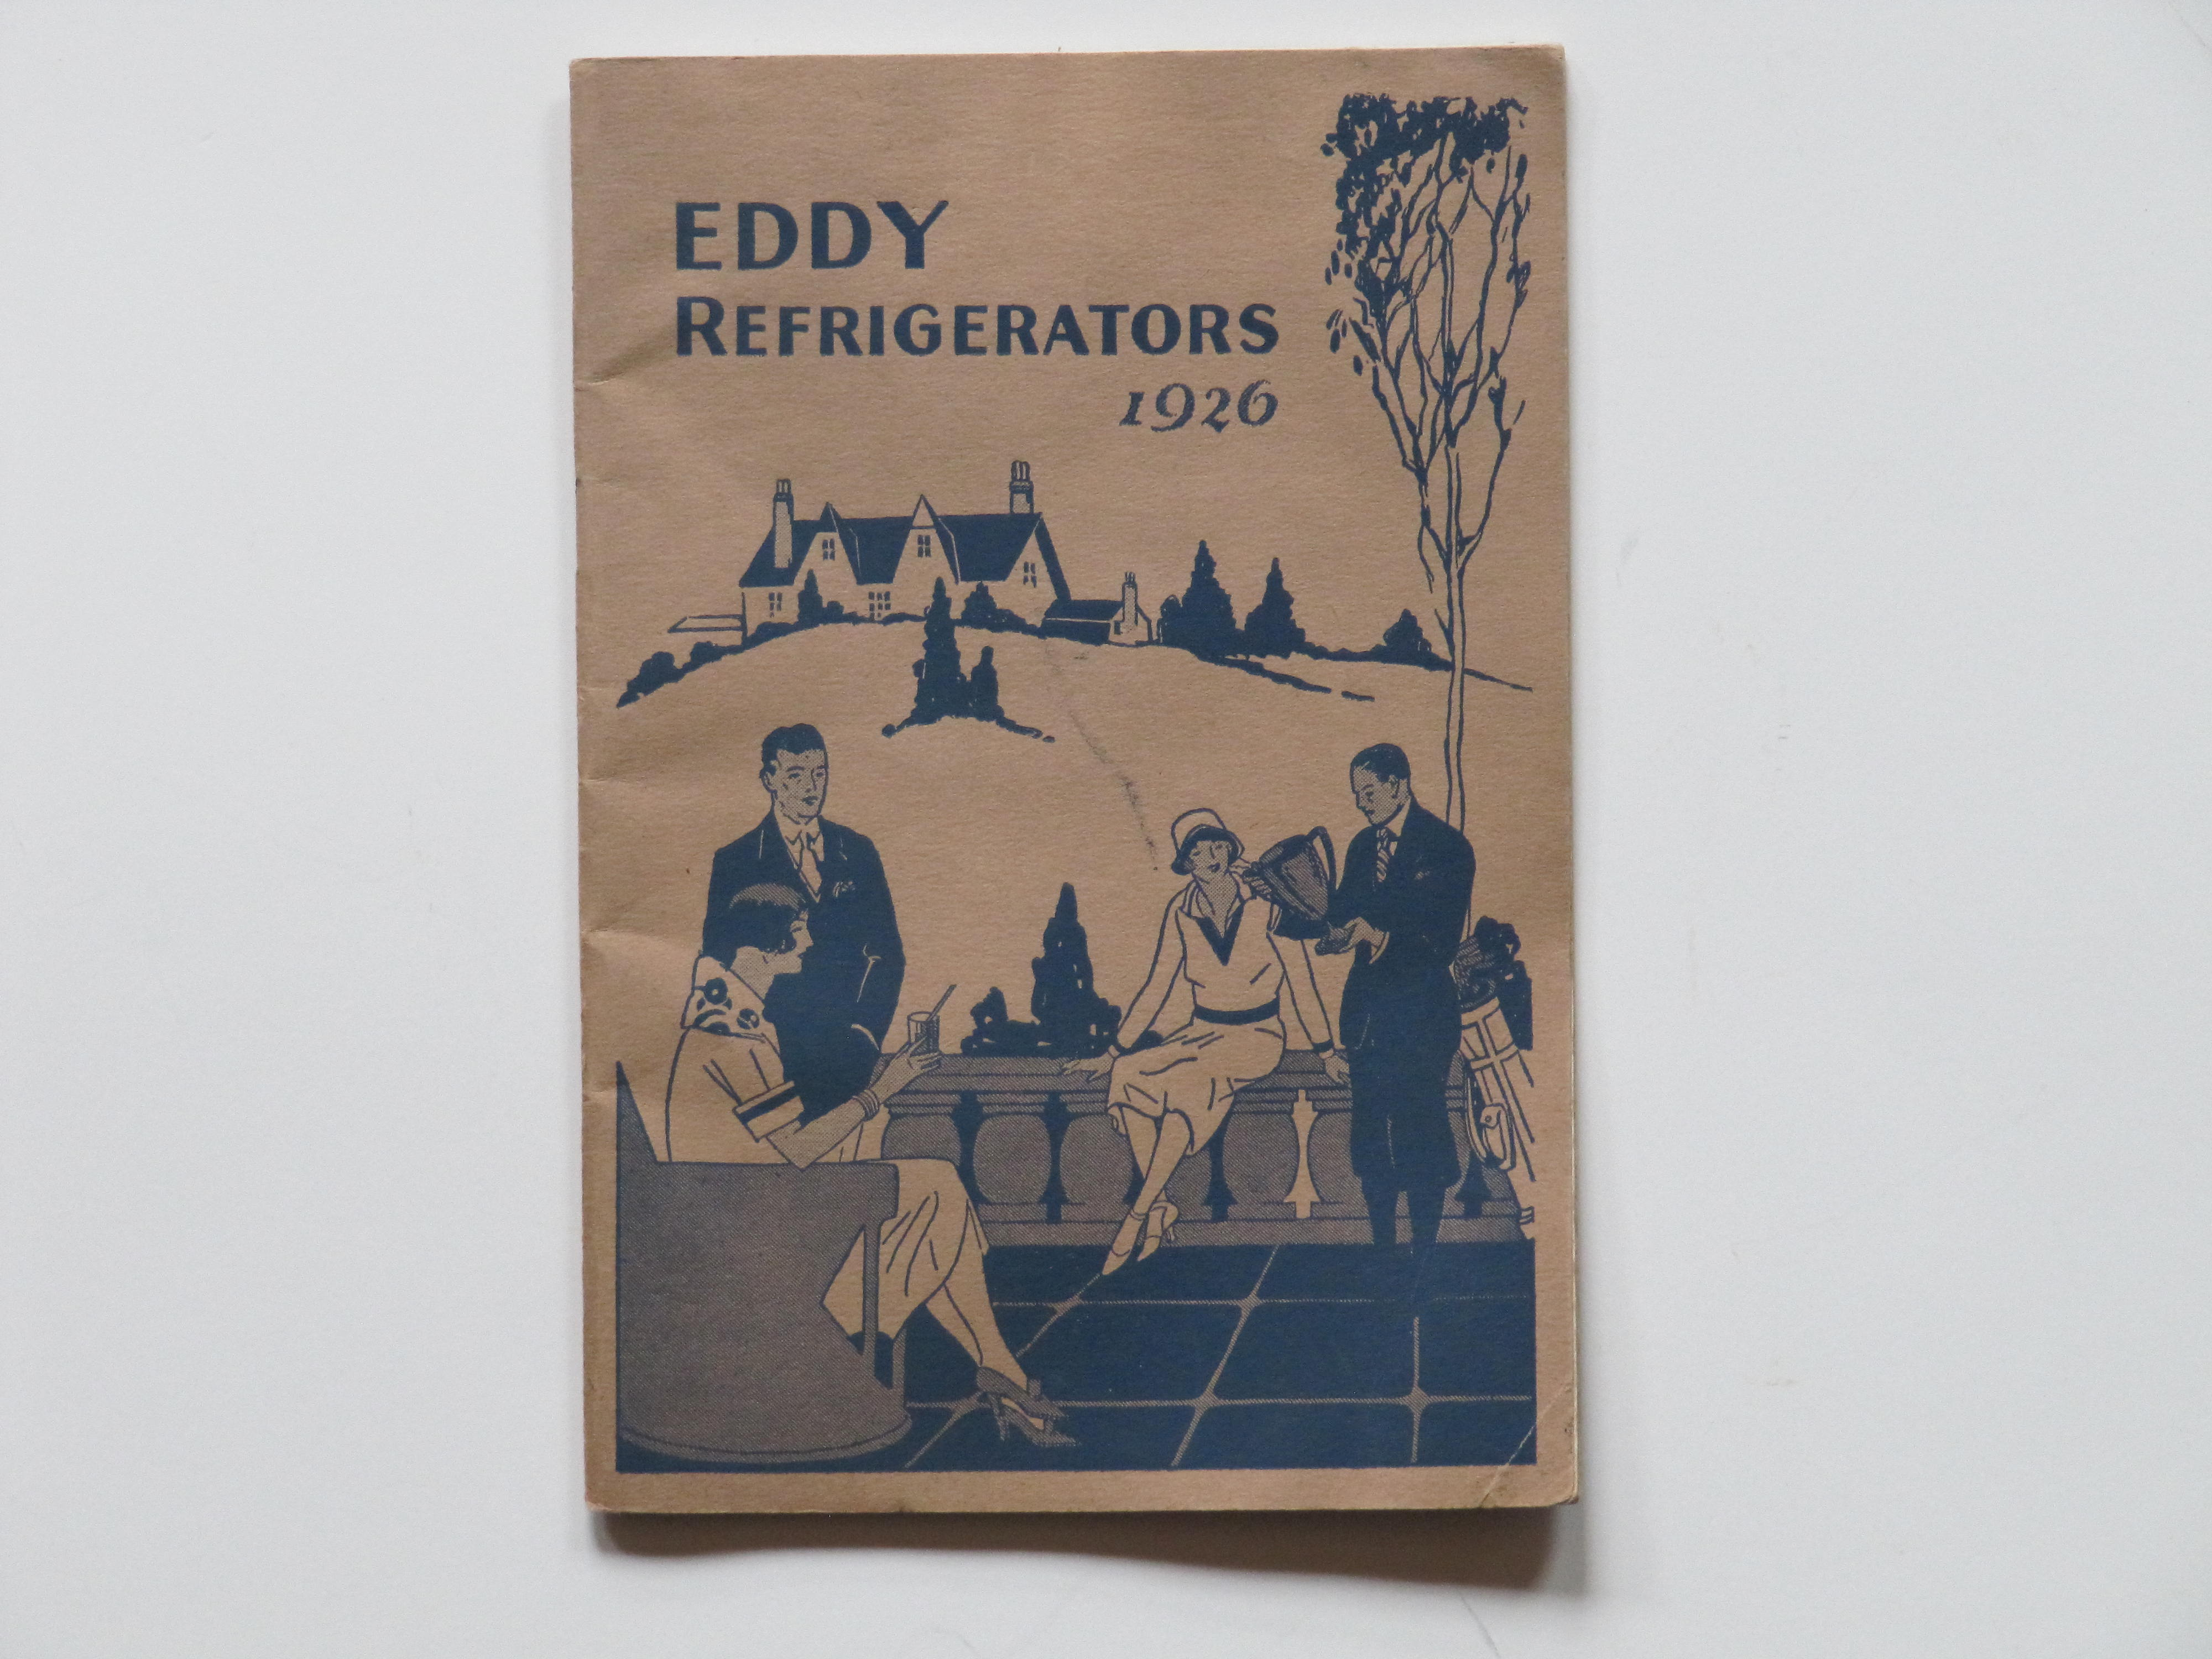 Eddy Refrigerators 1926